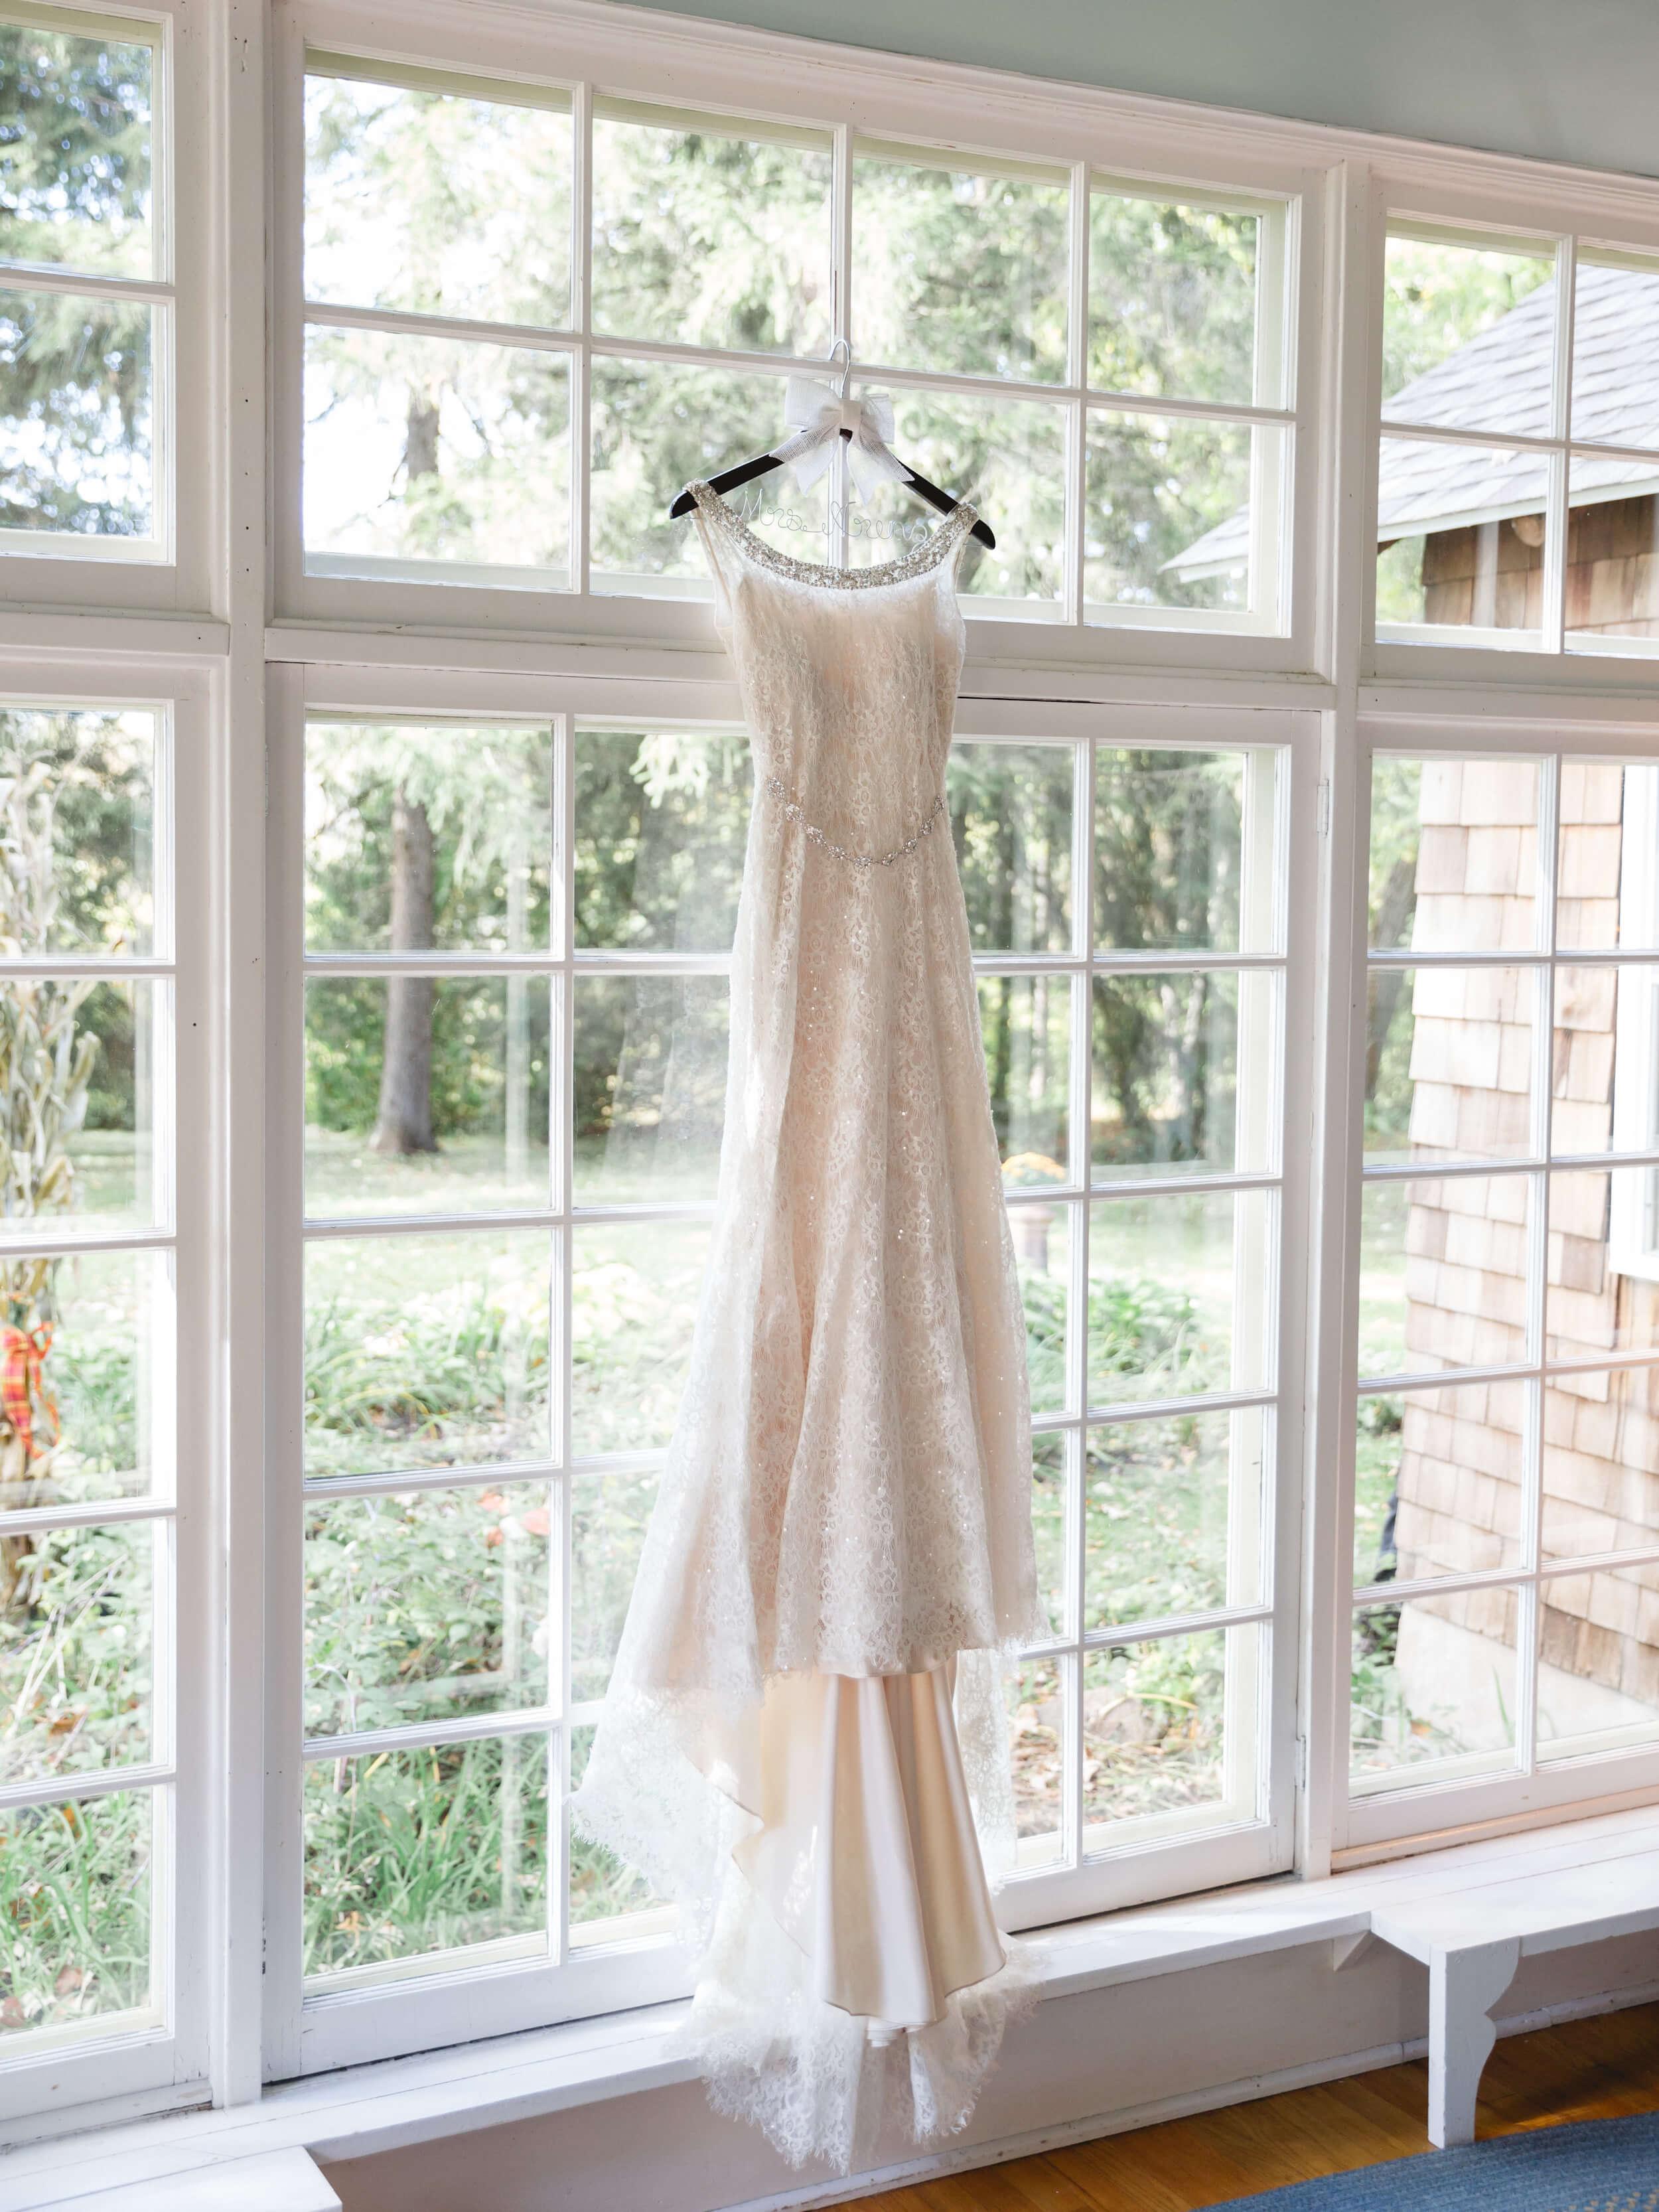 rochelle-louise-photography-acowsay-cinema-wisconsin-wedding-9.jpg